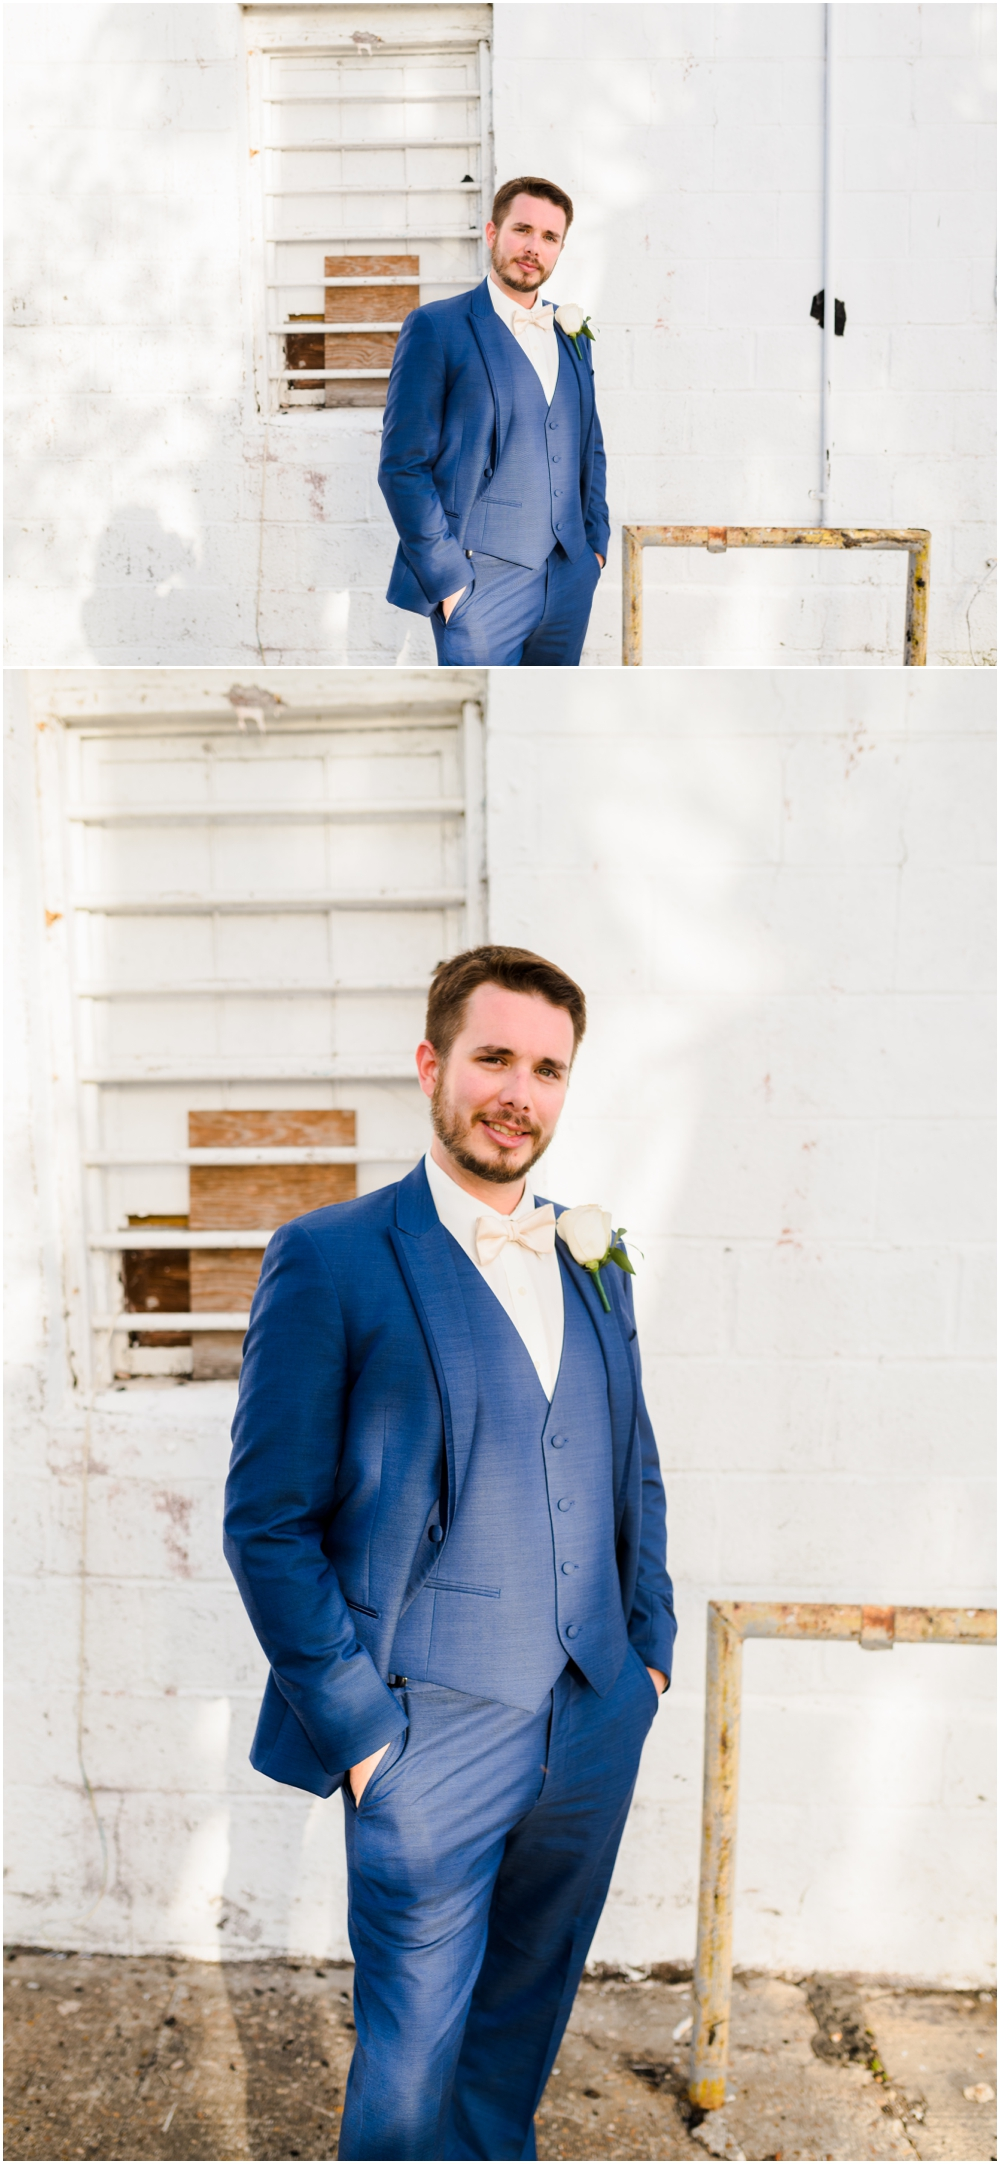 martin-wedding-panama-city-beach-florida-kiersten-stevenson-photography-89.jpg